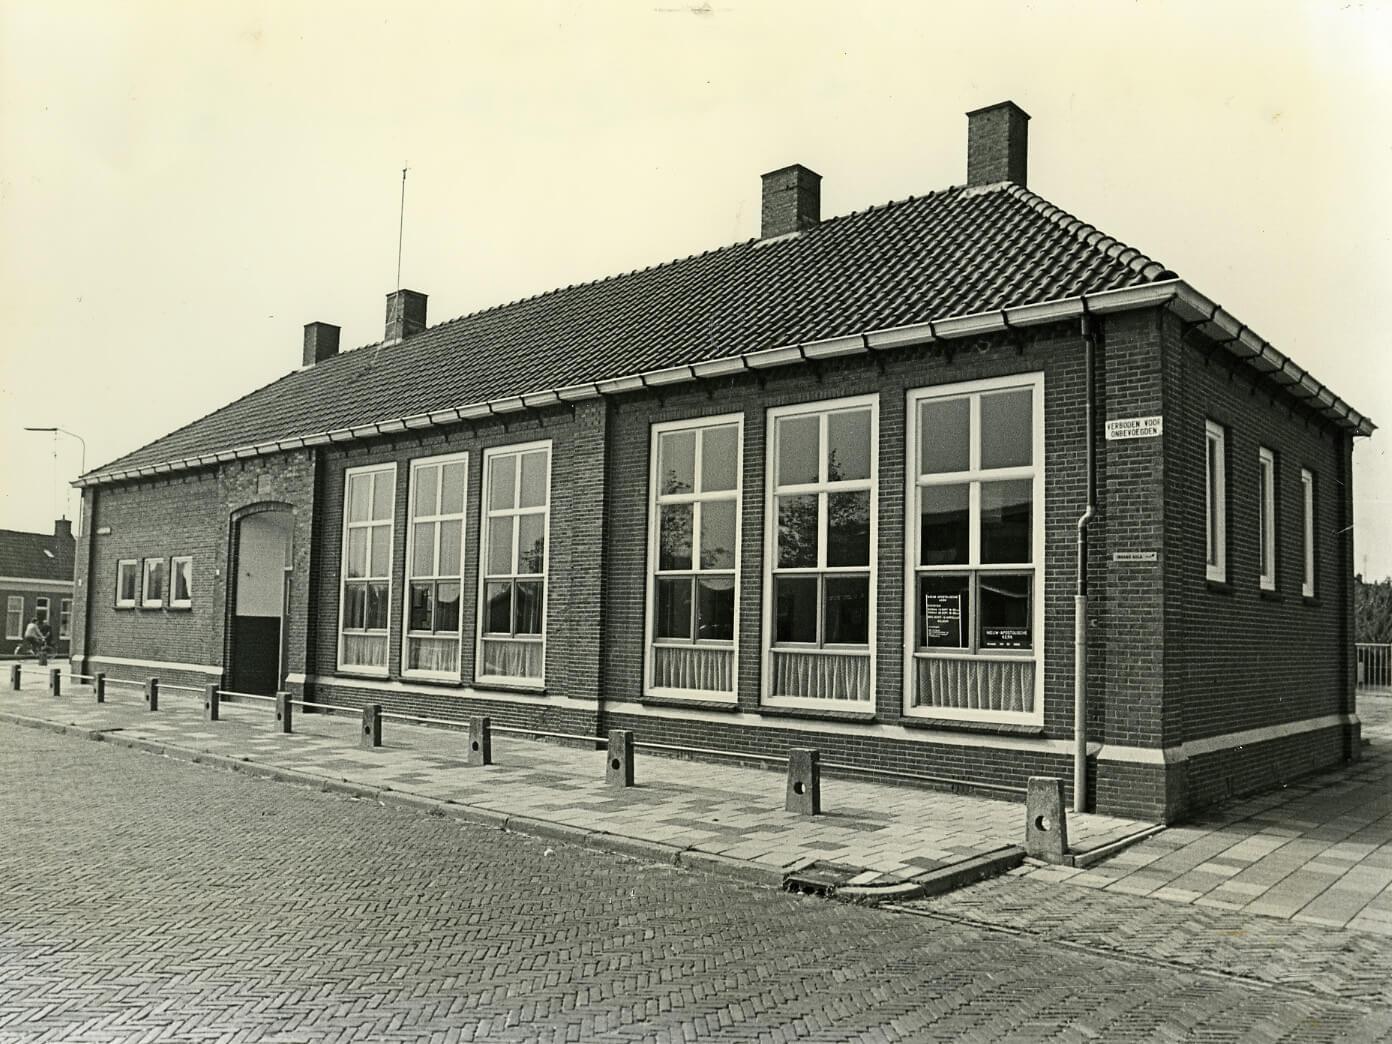 wilhelminaschool